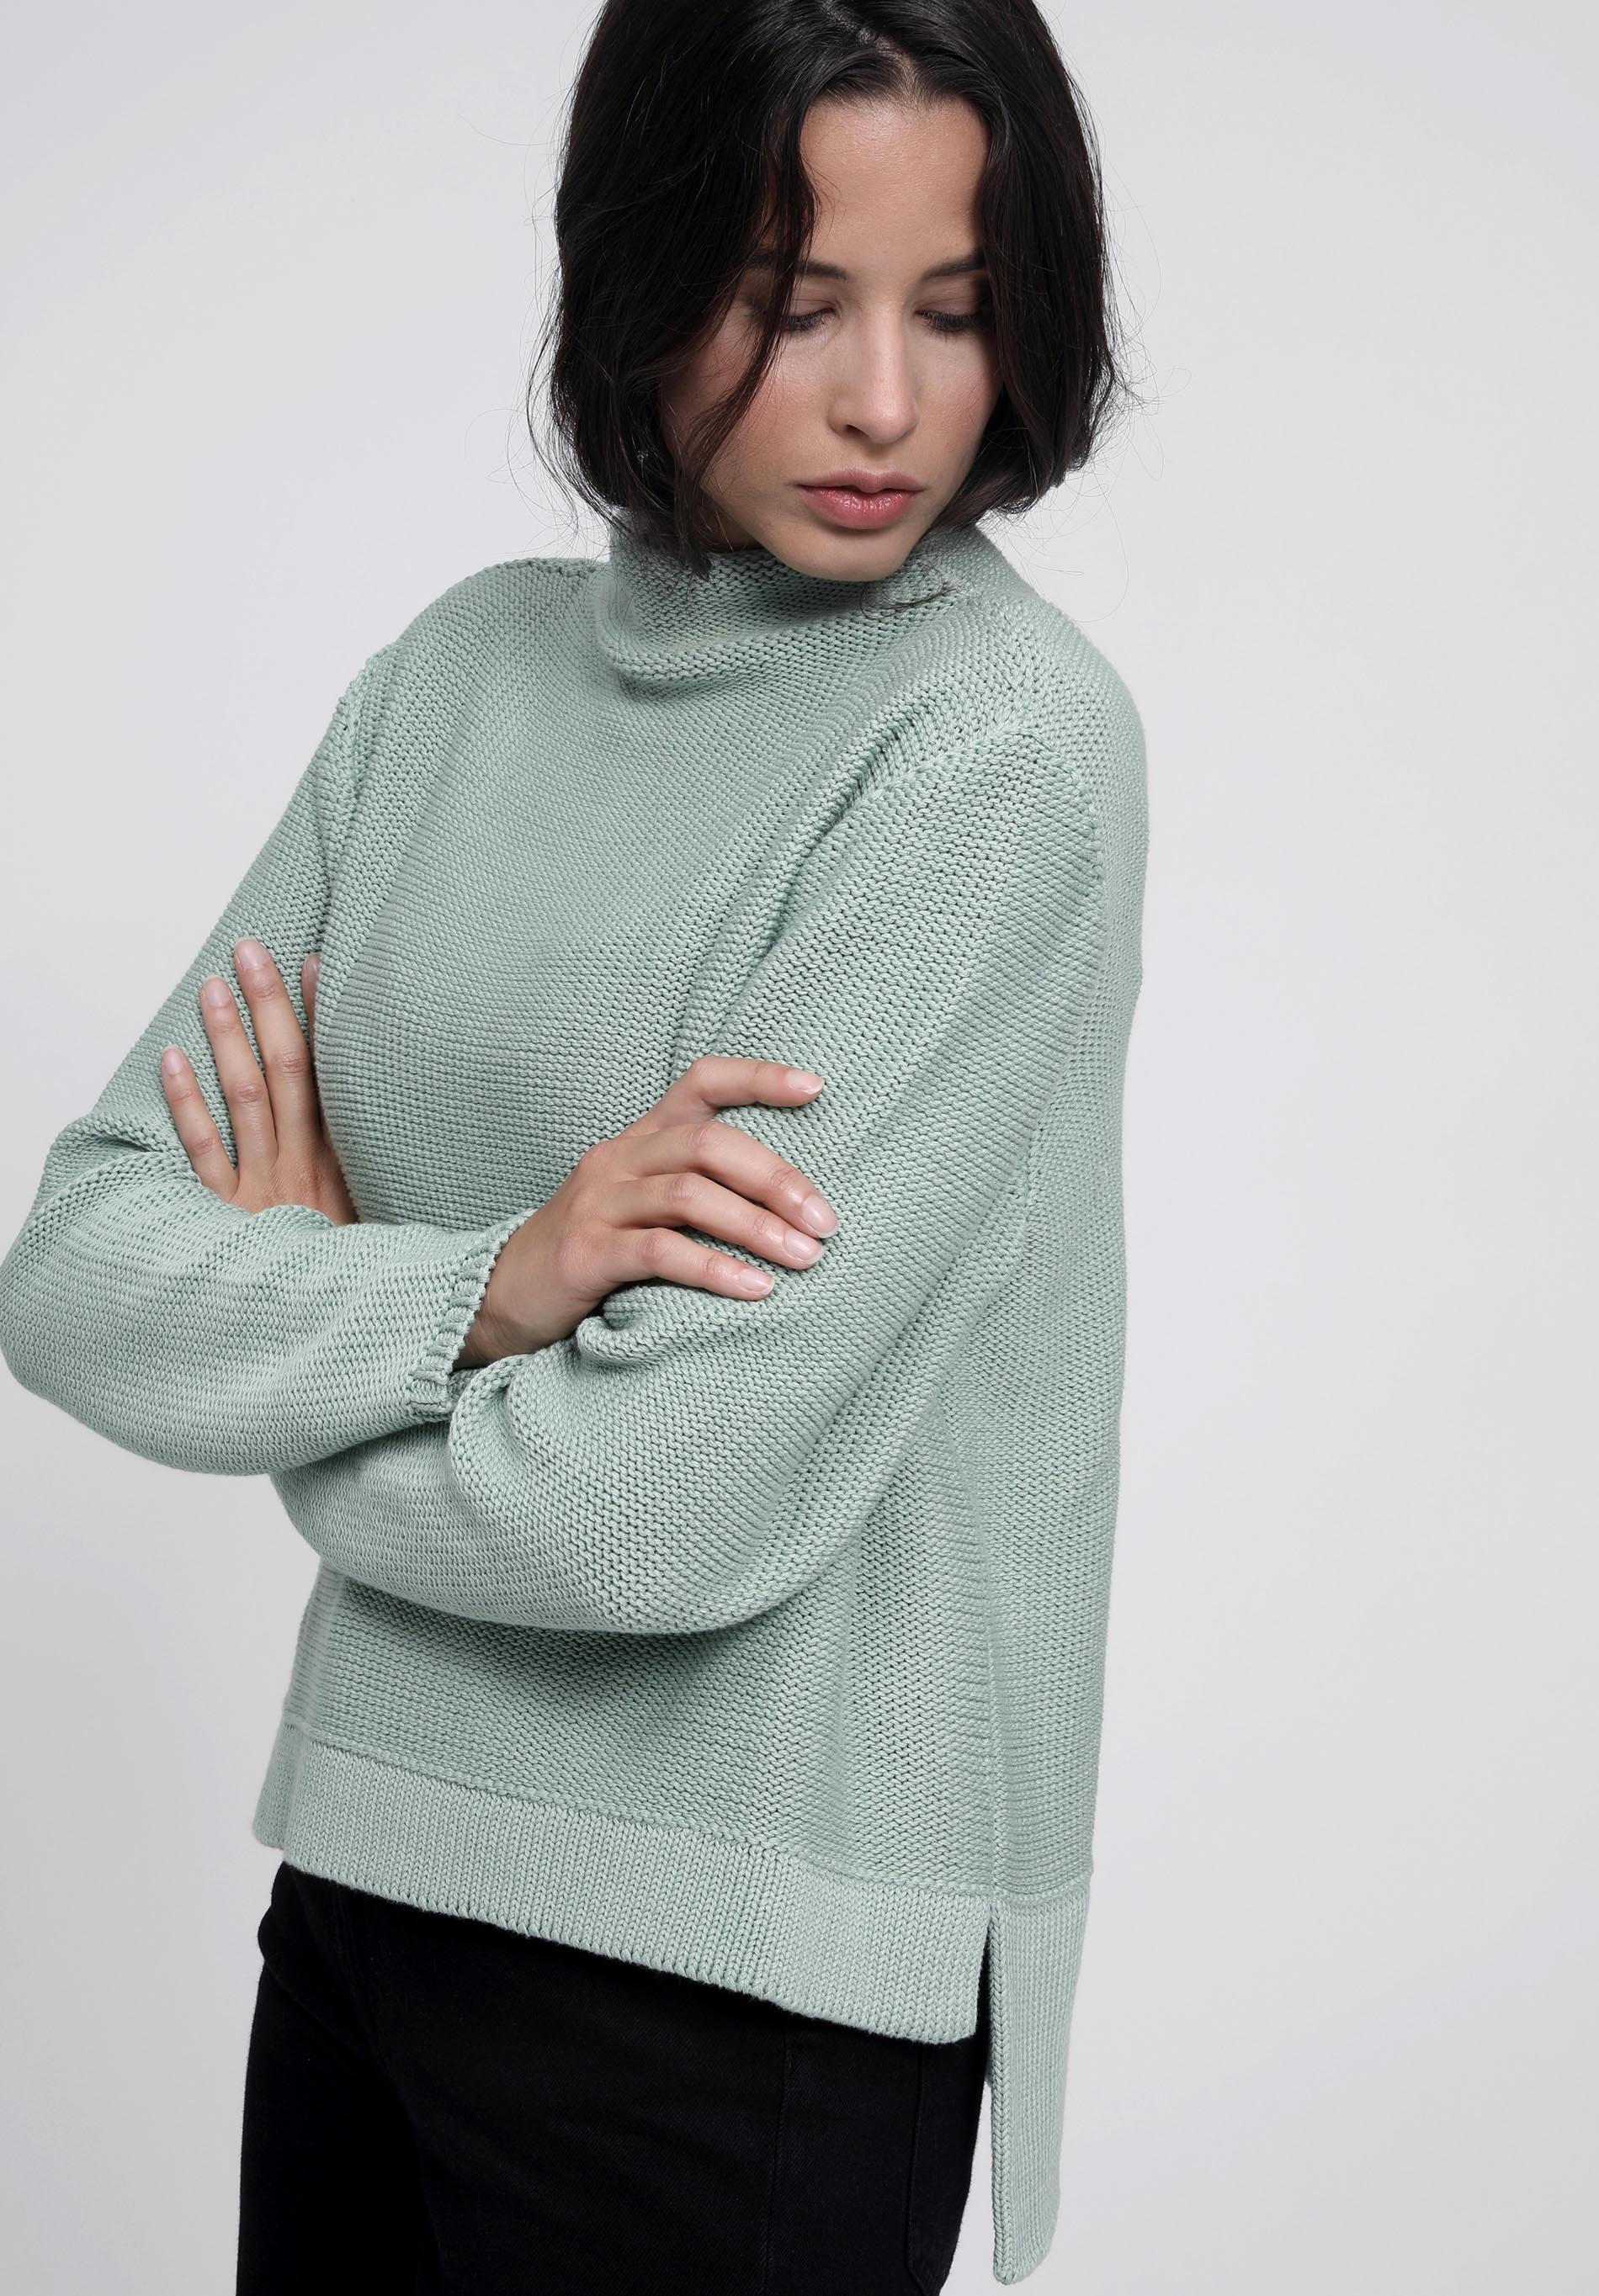 Pullover SABIK jade organic cotton